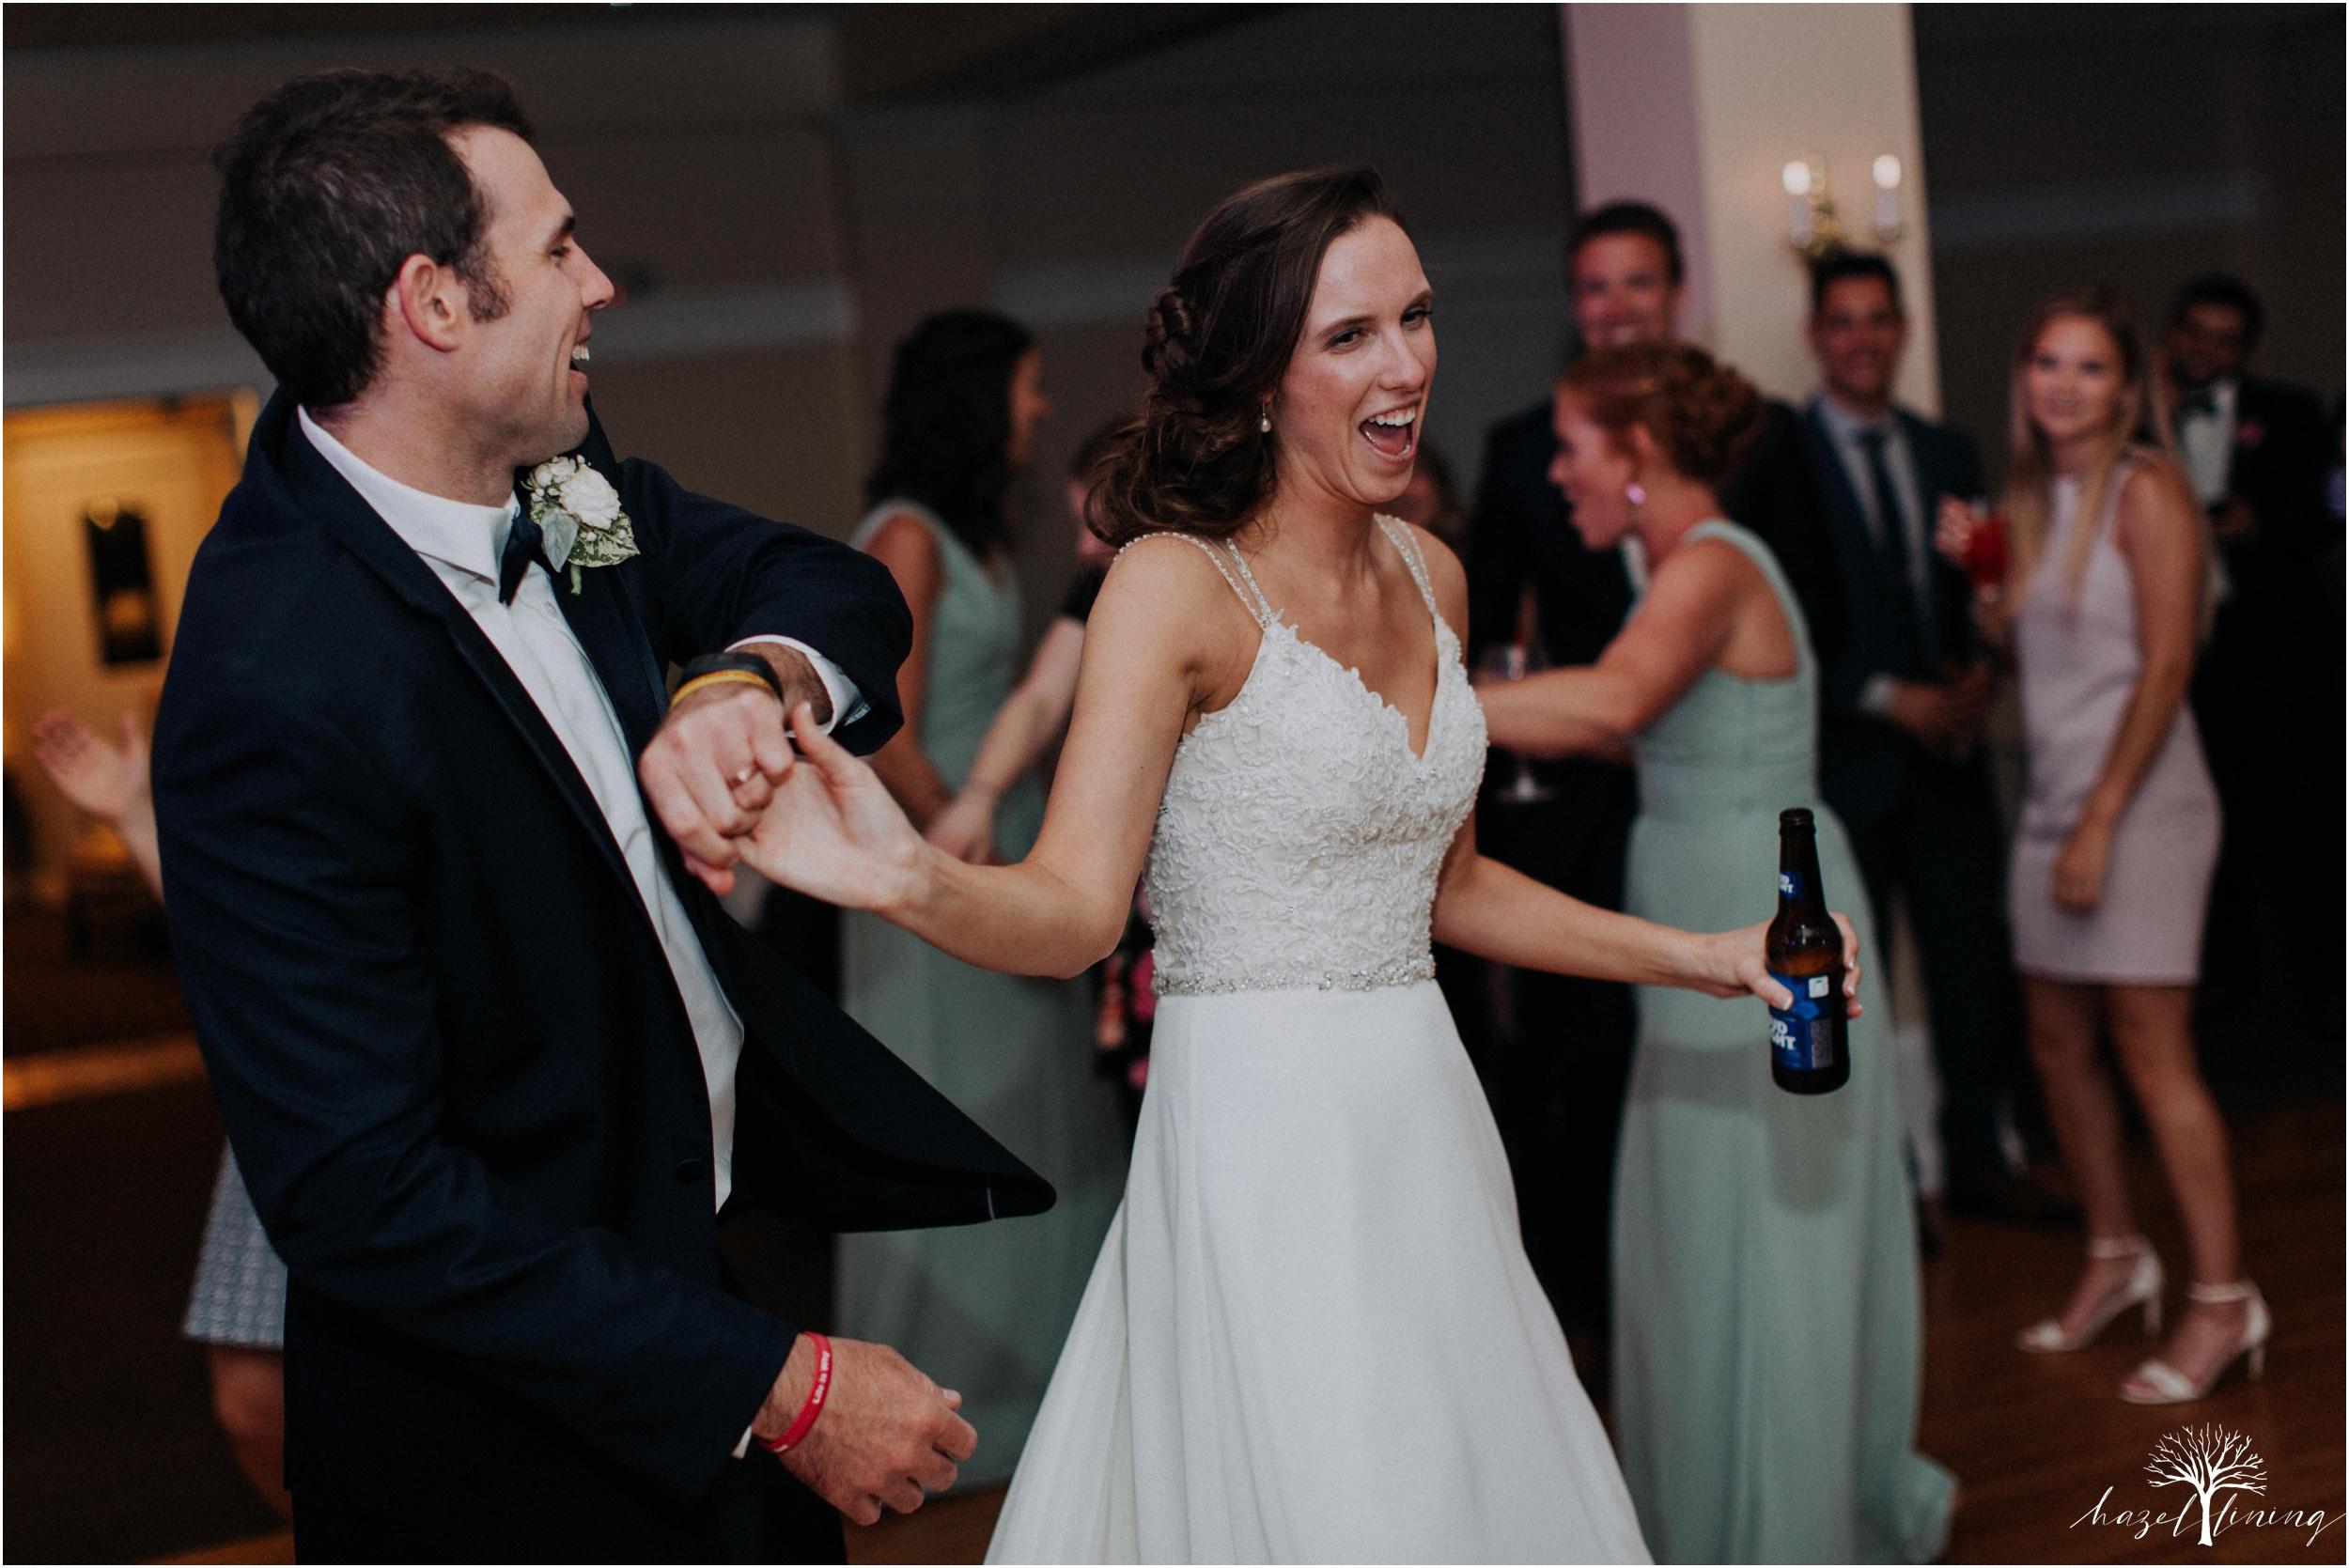 hazel-lining-travel-wedding-elopement-photography_0156.jpg